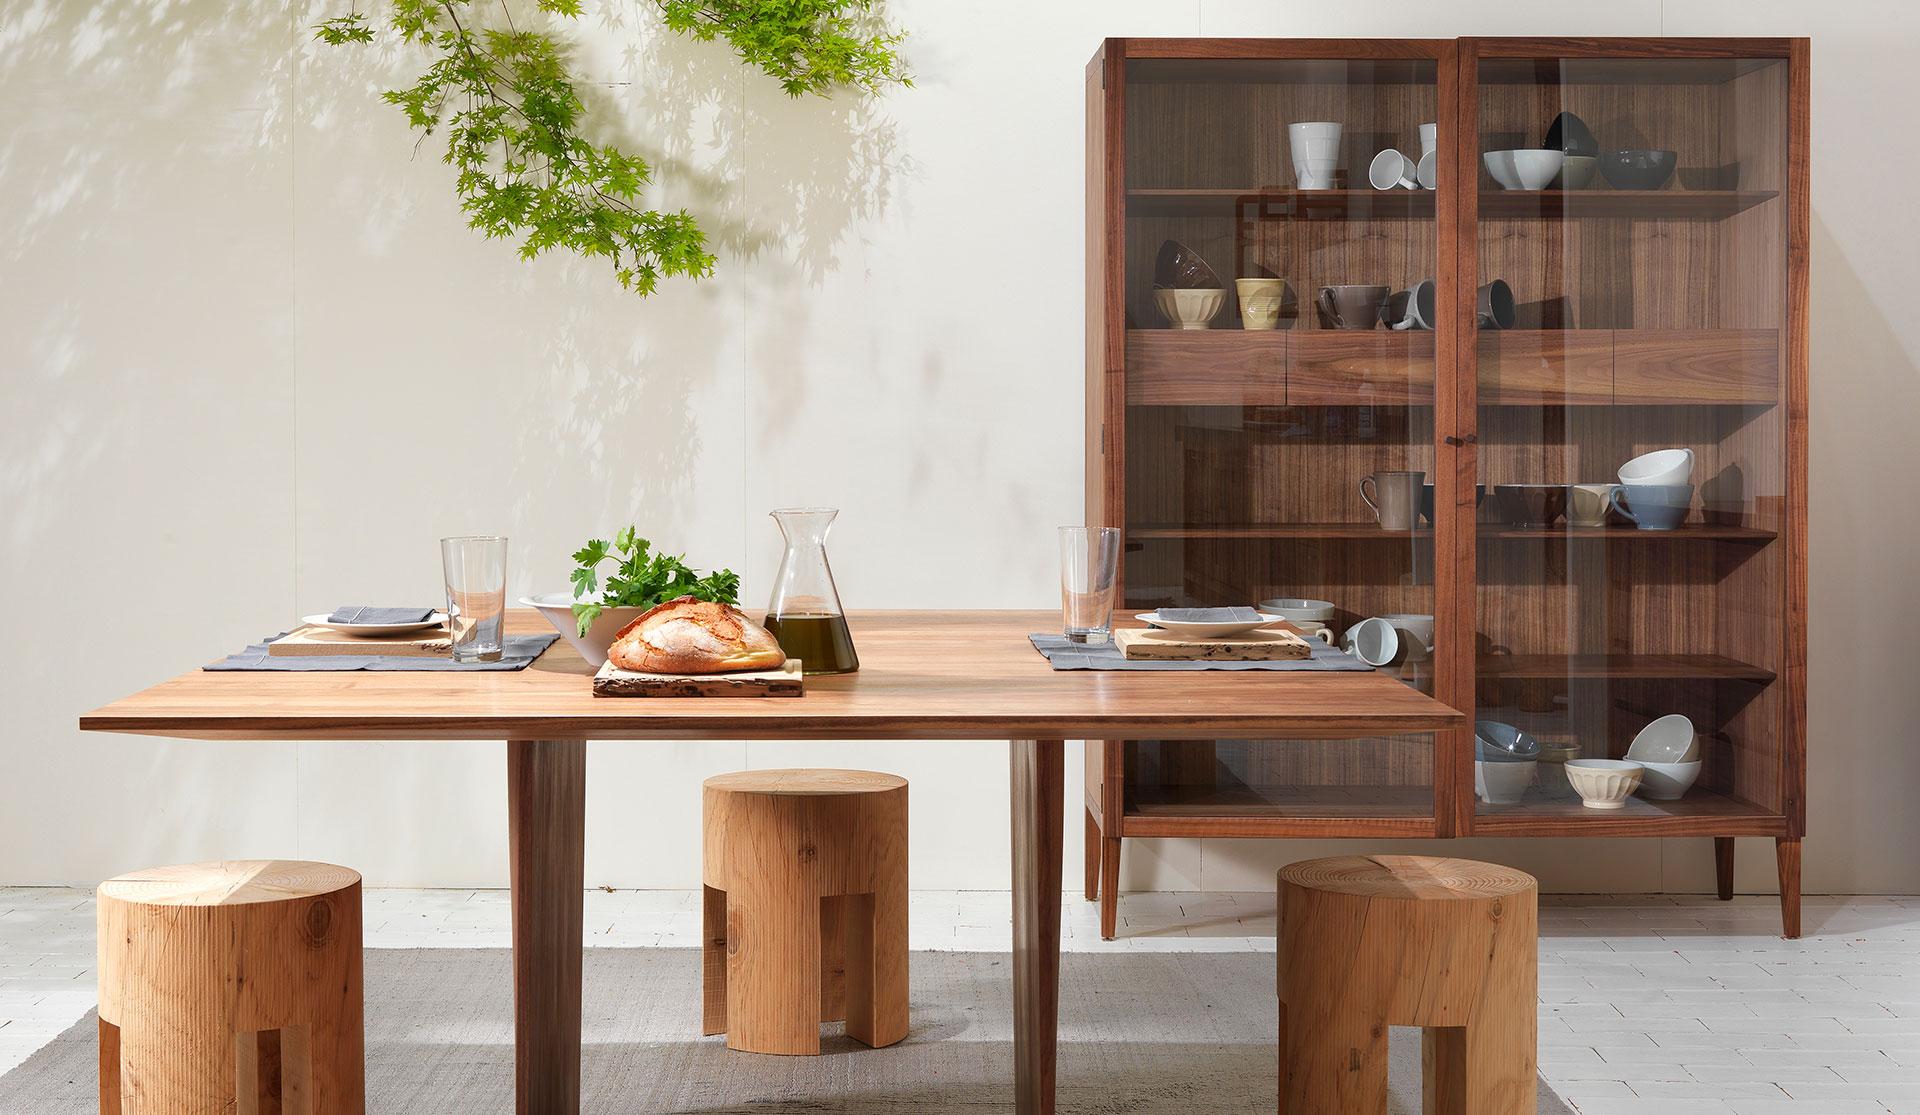 Kitchen for riva matteo thun partners